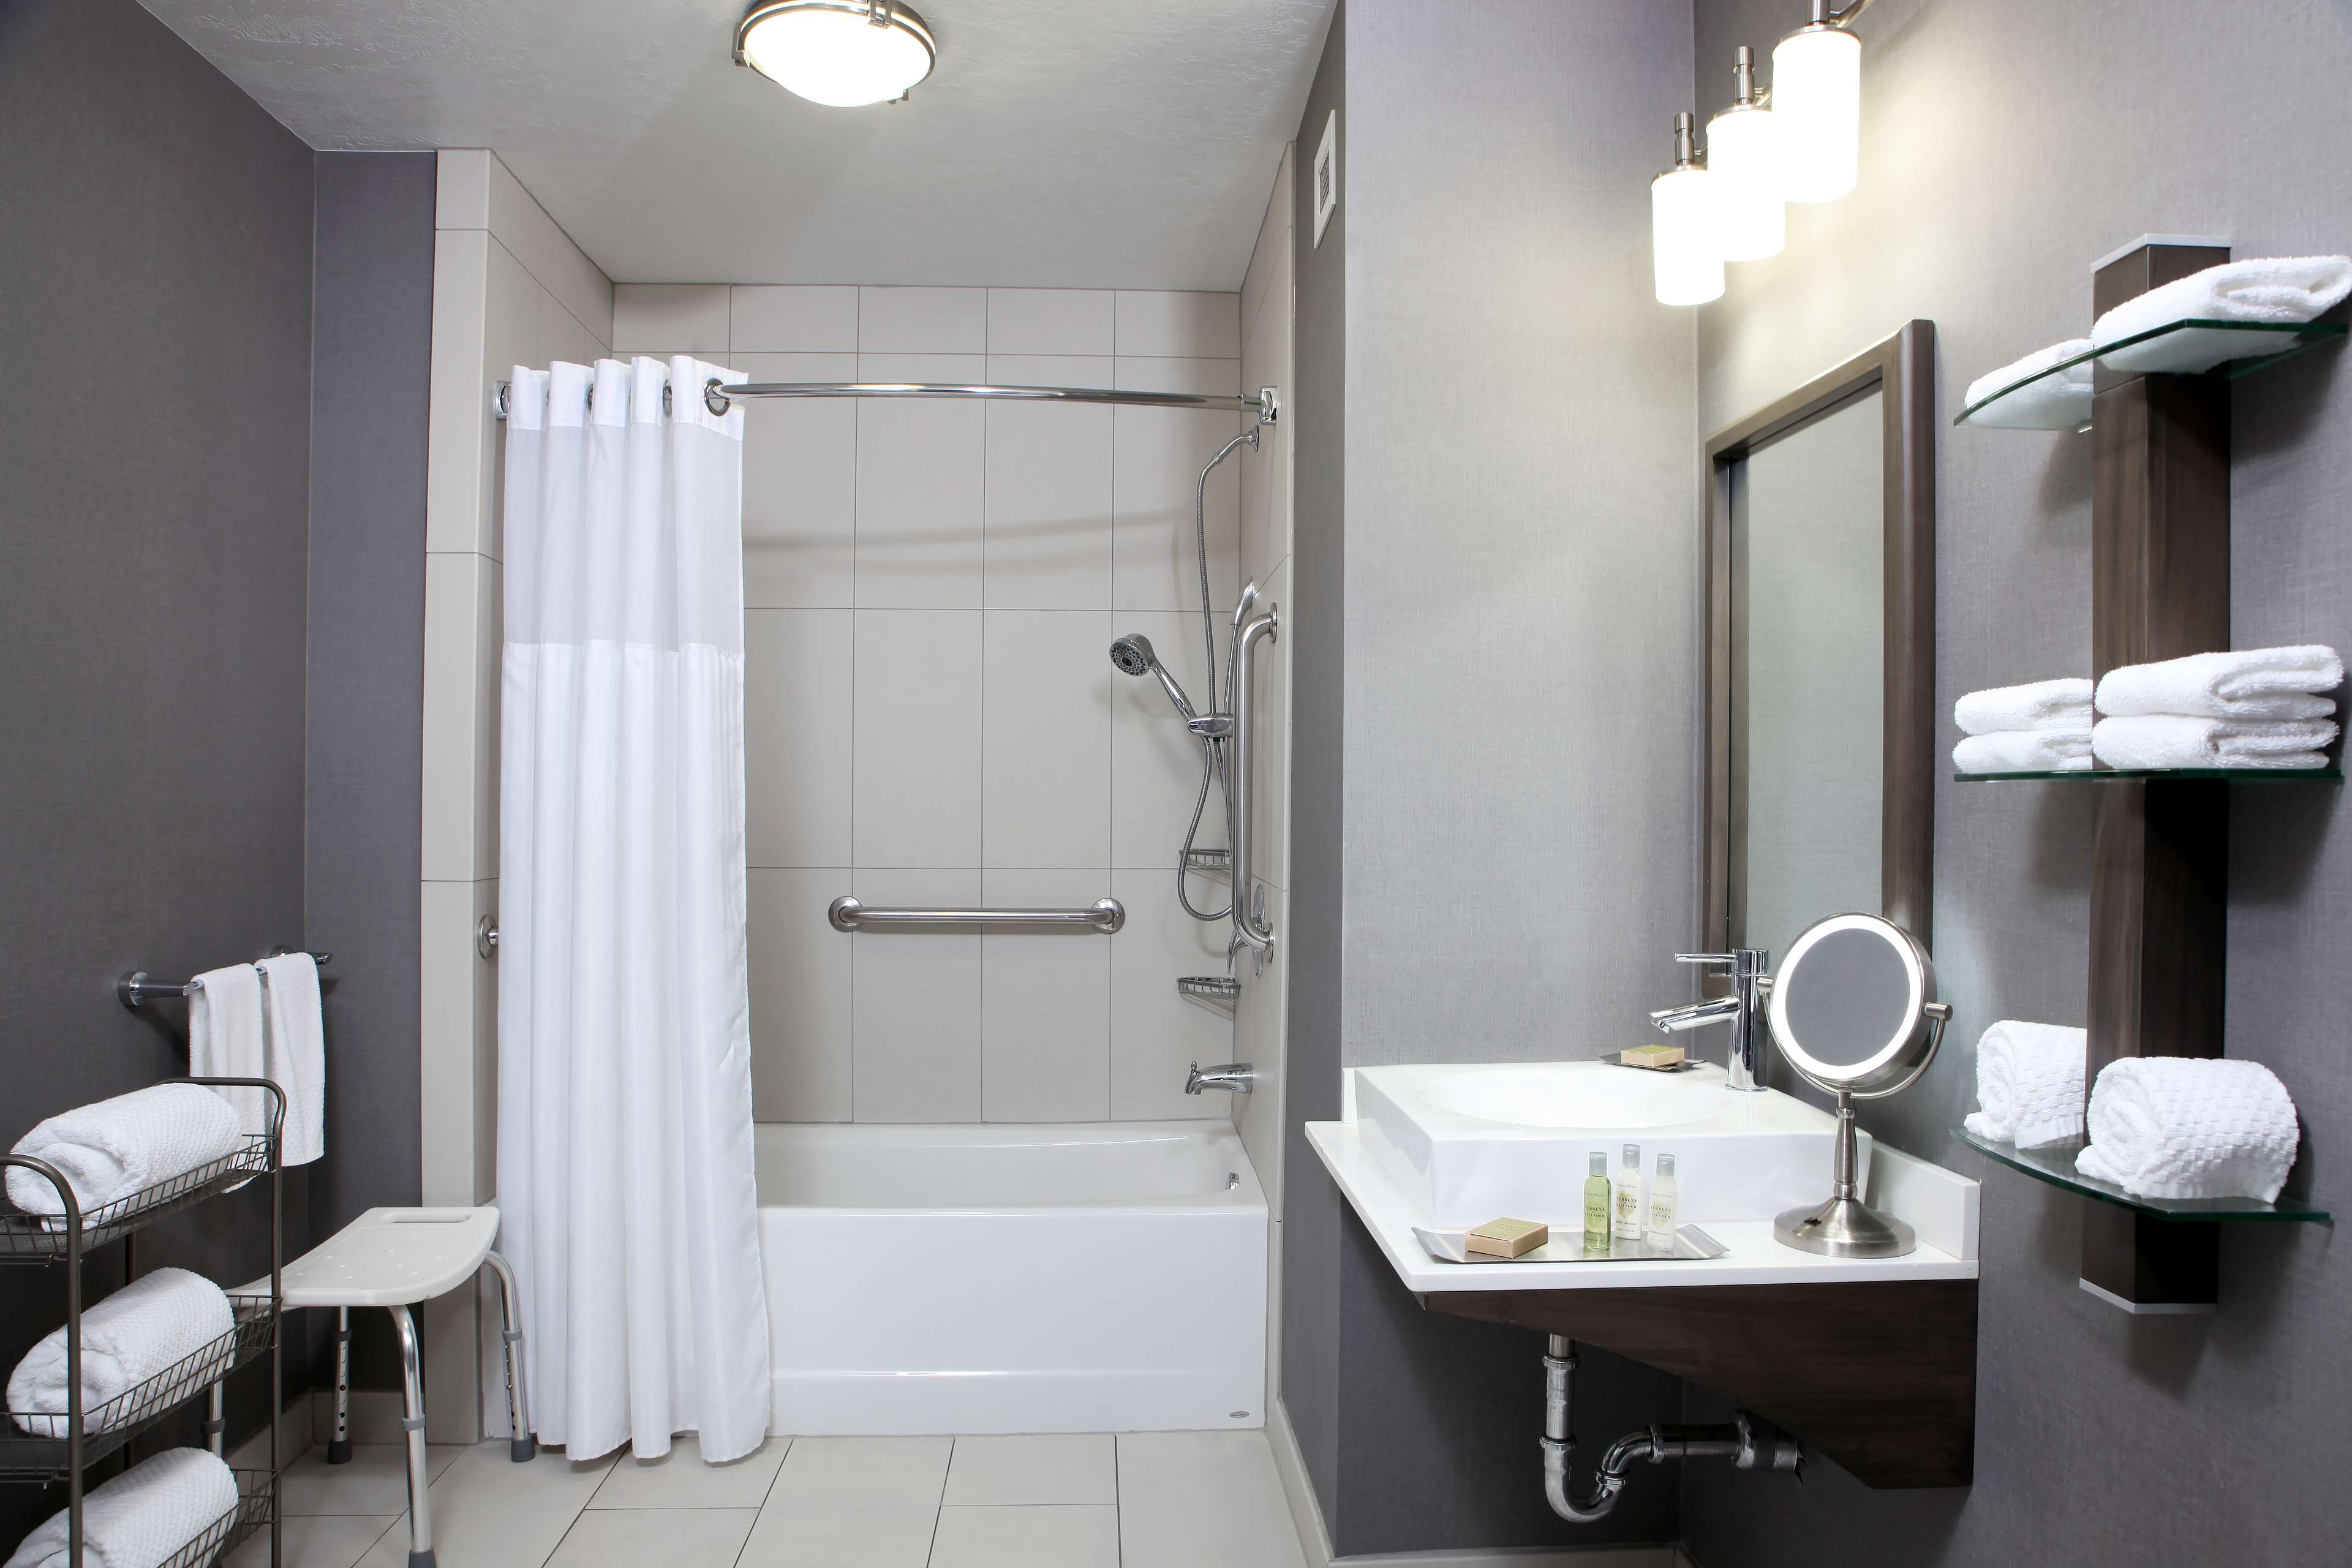 DoubleTree by Hilton West Fargo image 21